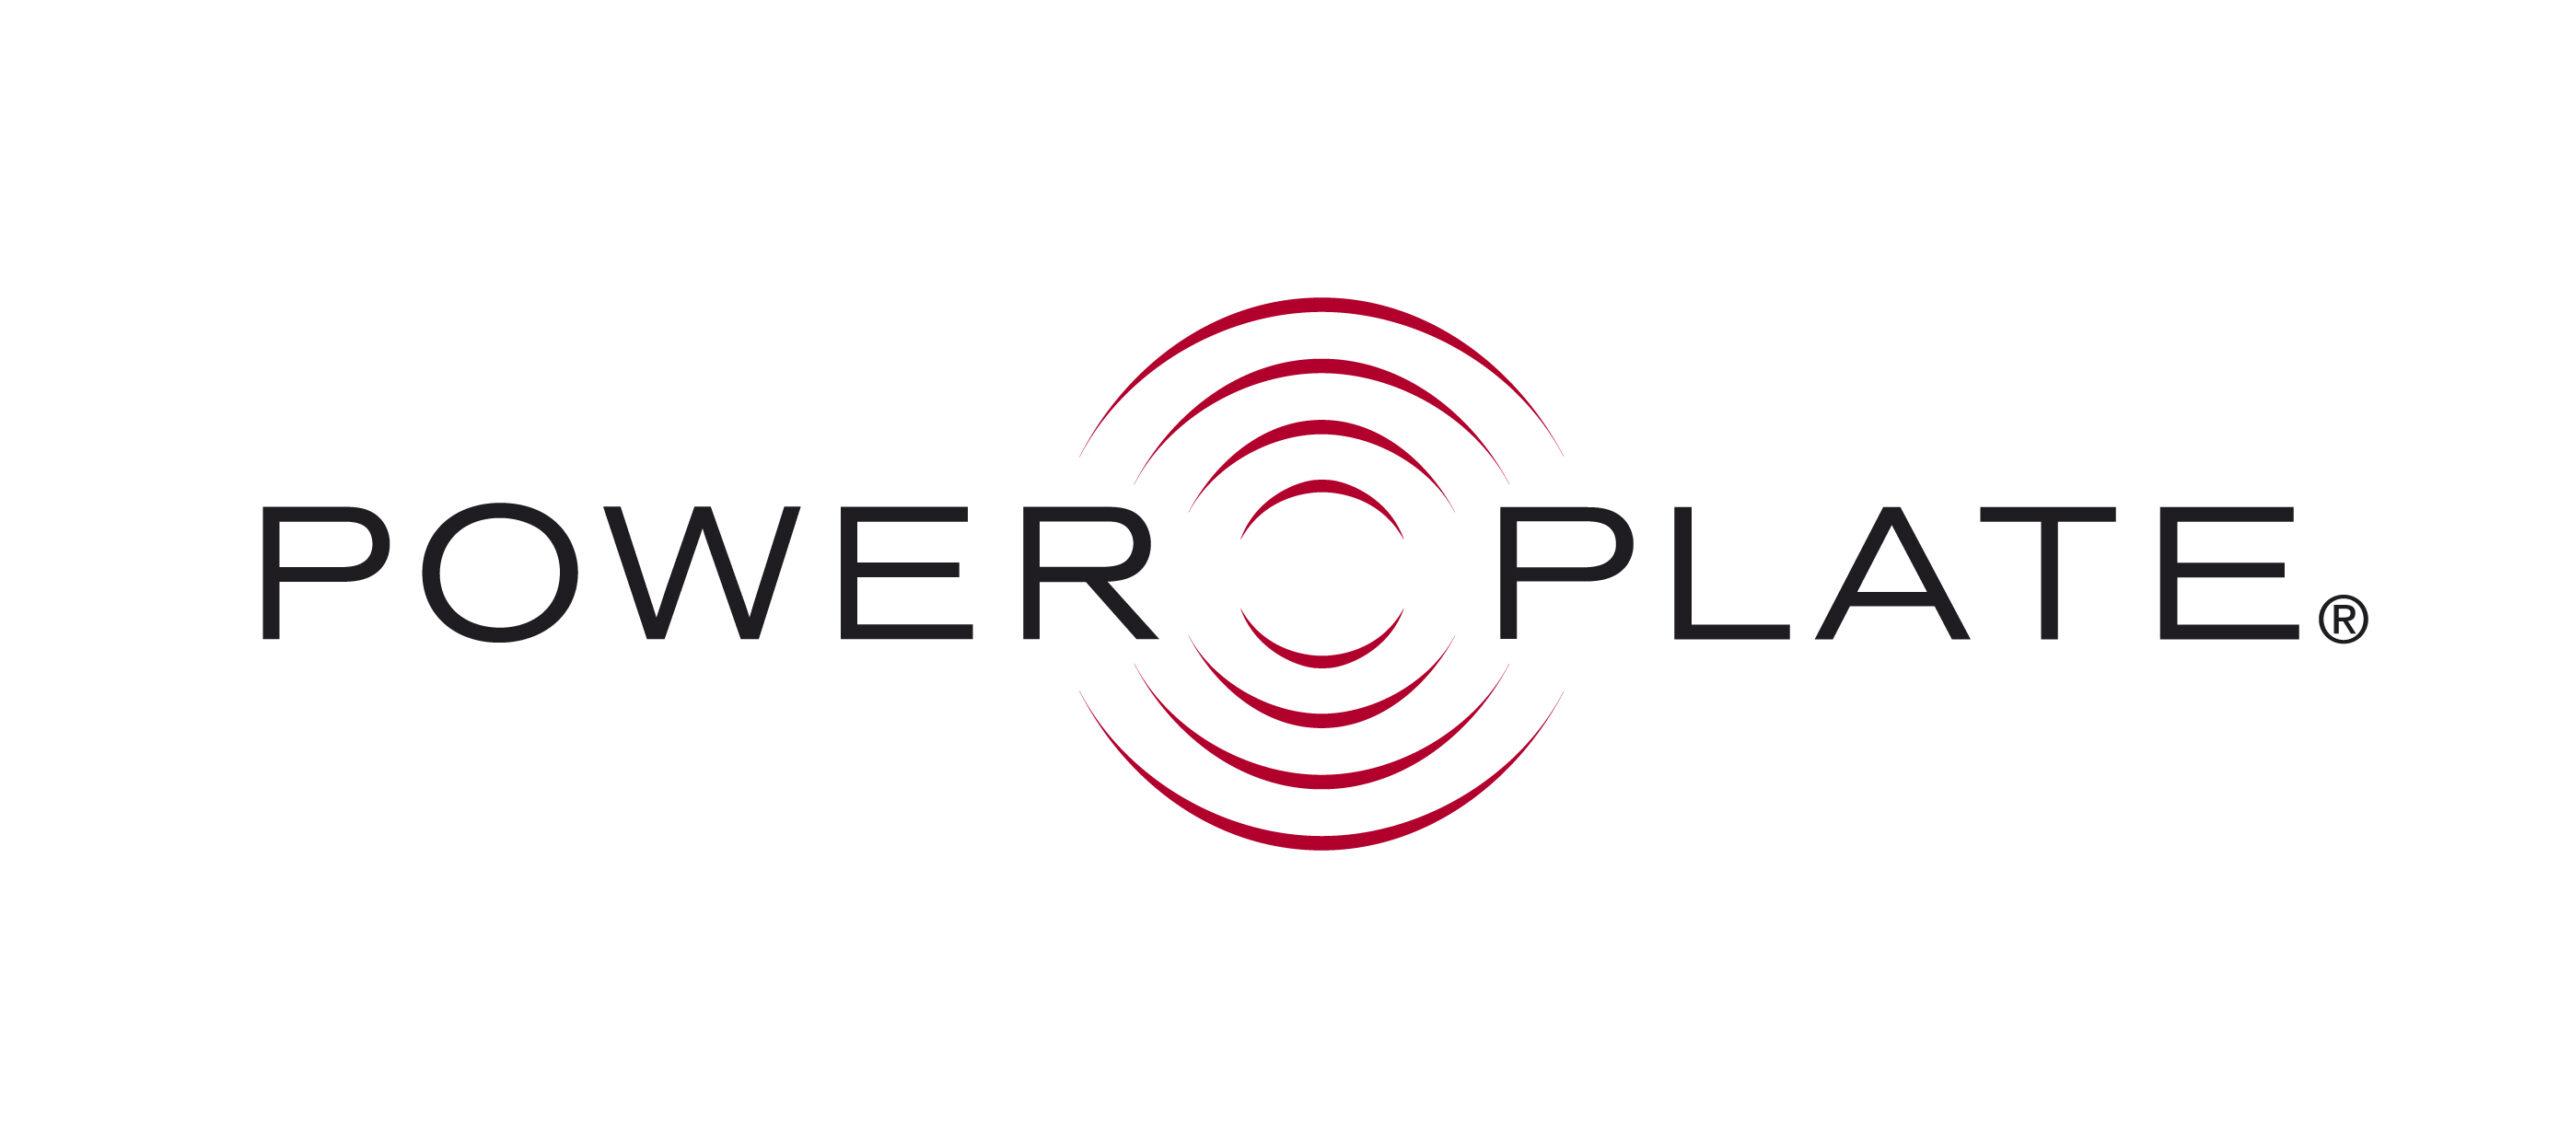 Power Plate Pulse